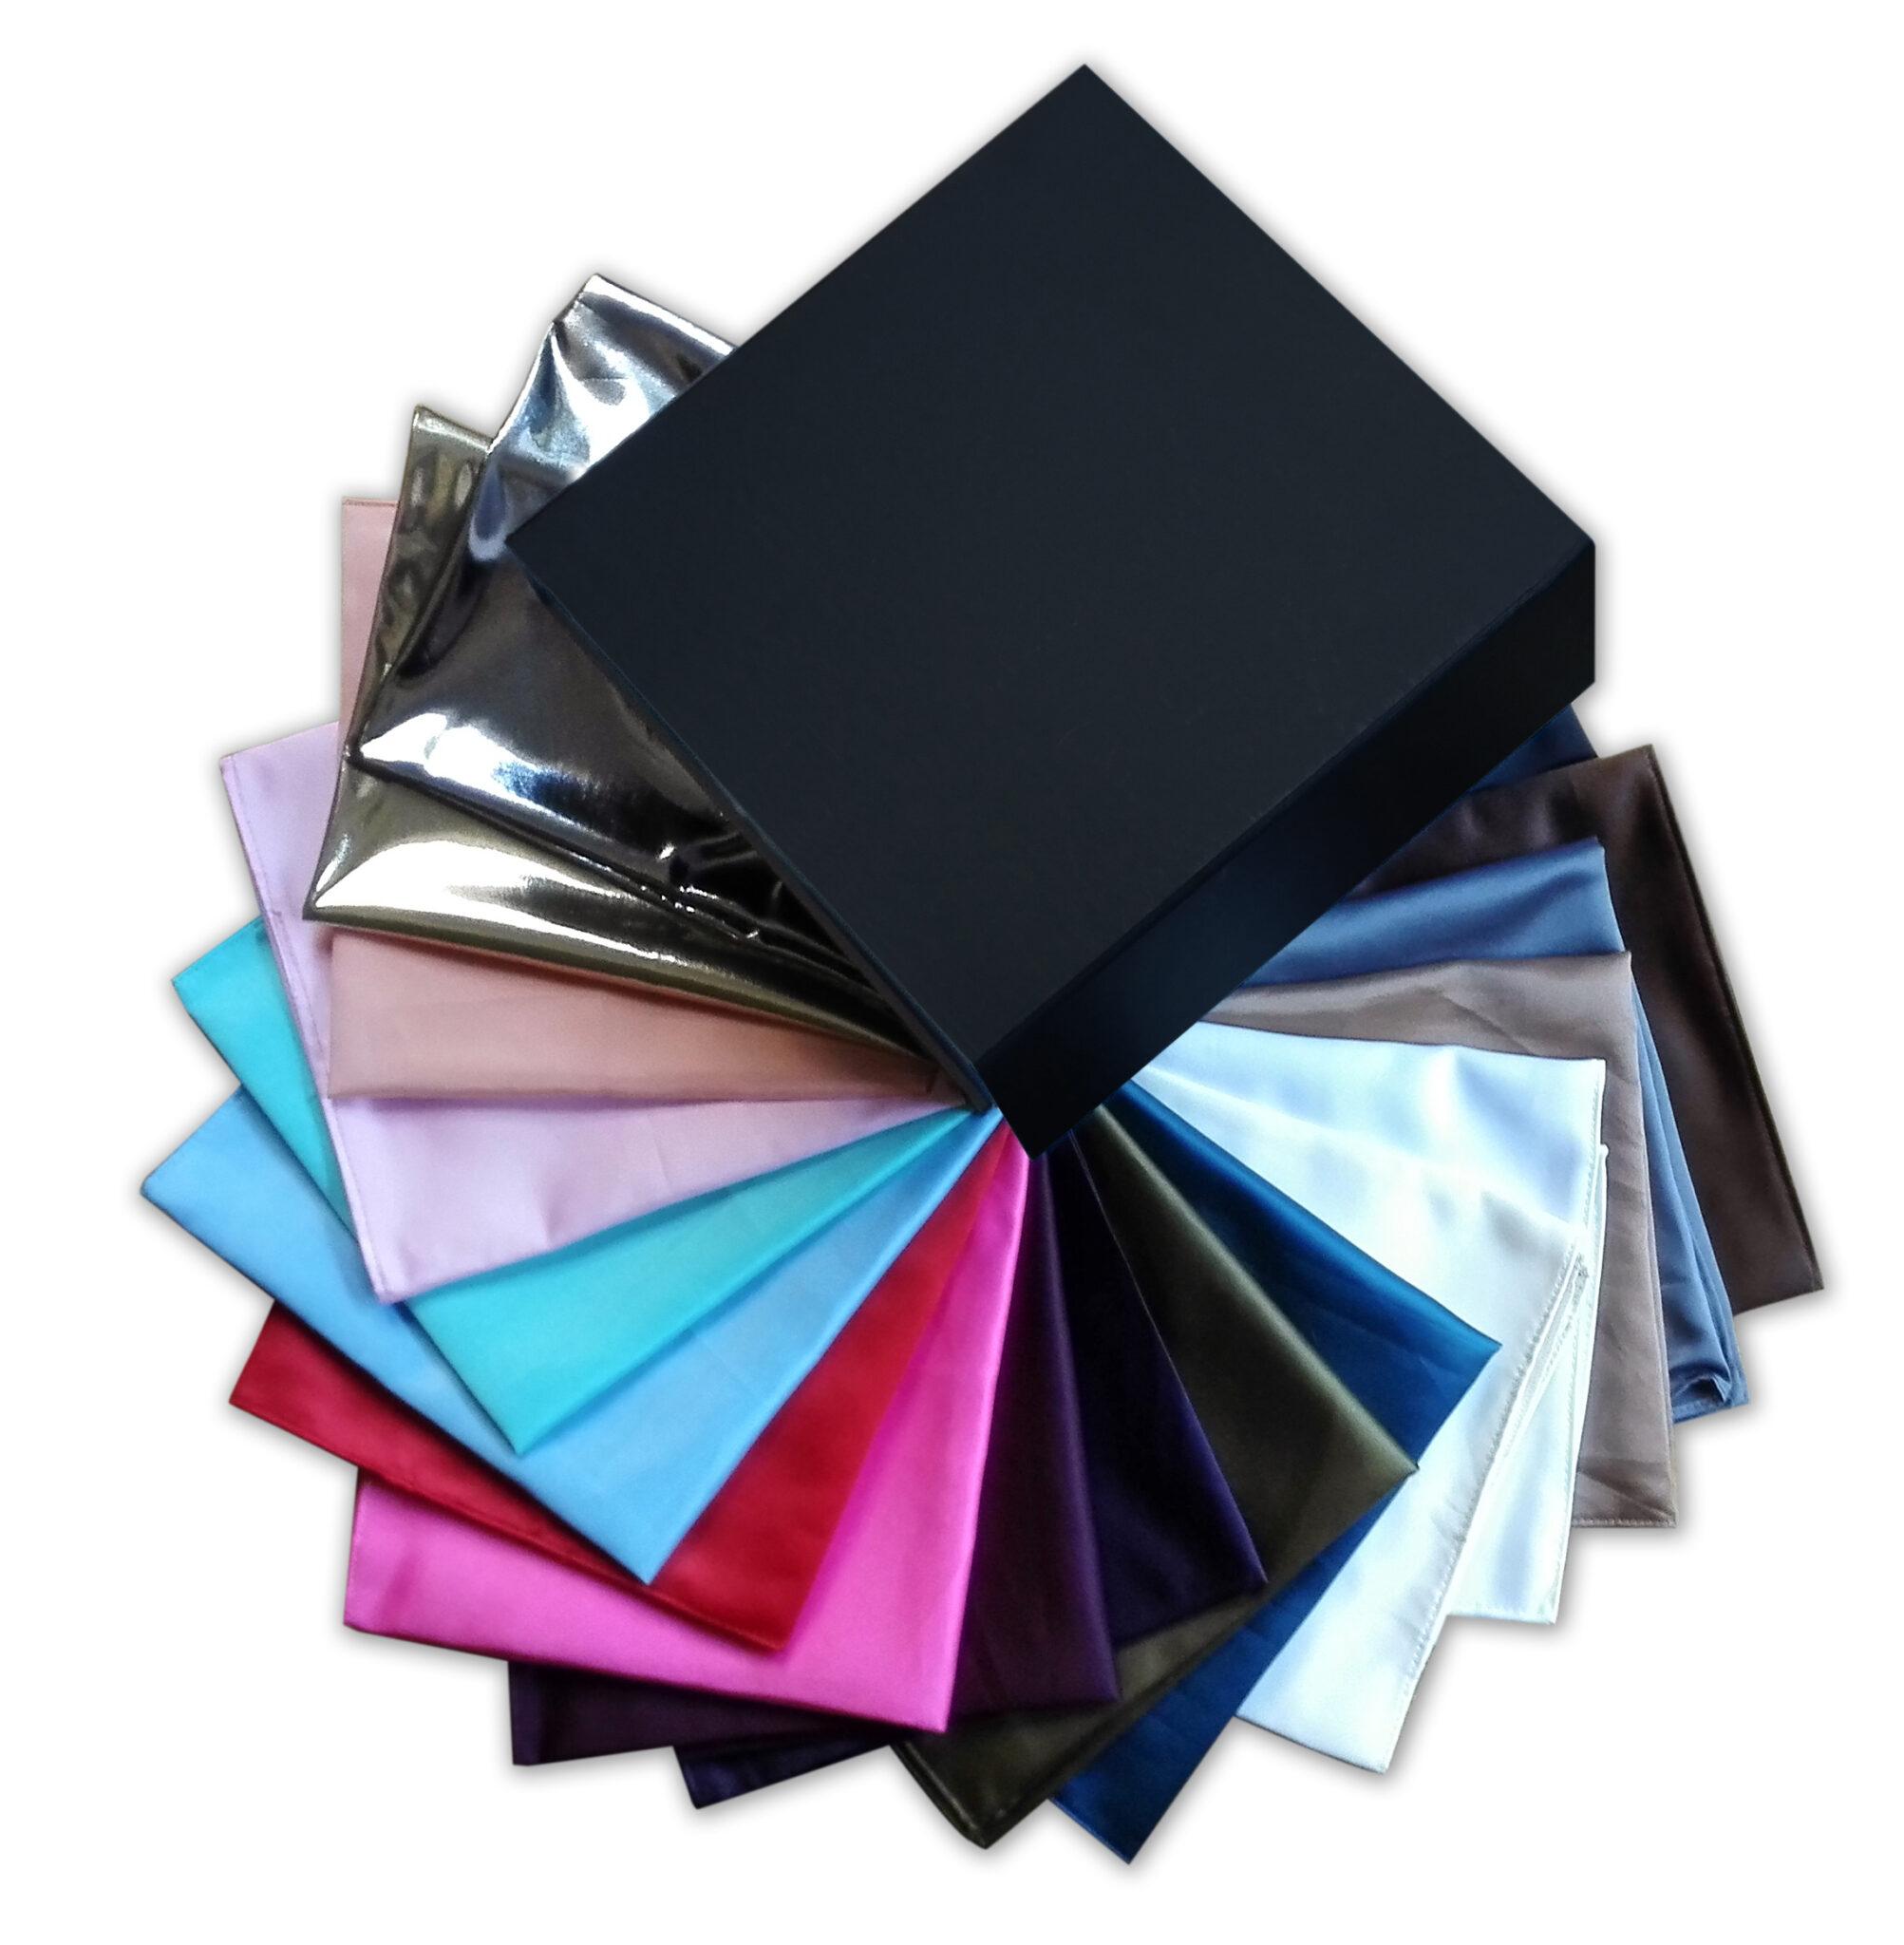 gamme de couleurs en tissu image nouvelle. Black Bedroom Furniture Sets. Home Design Ideas